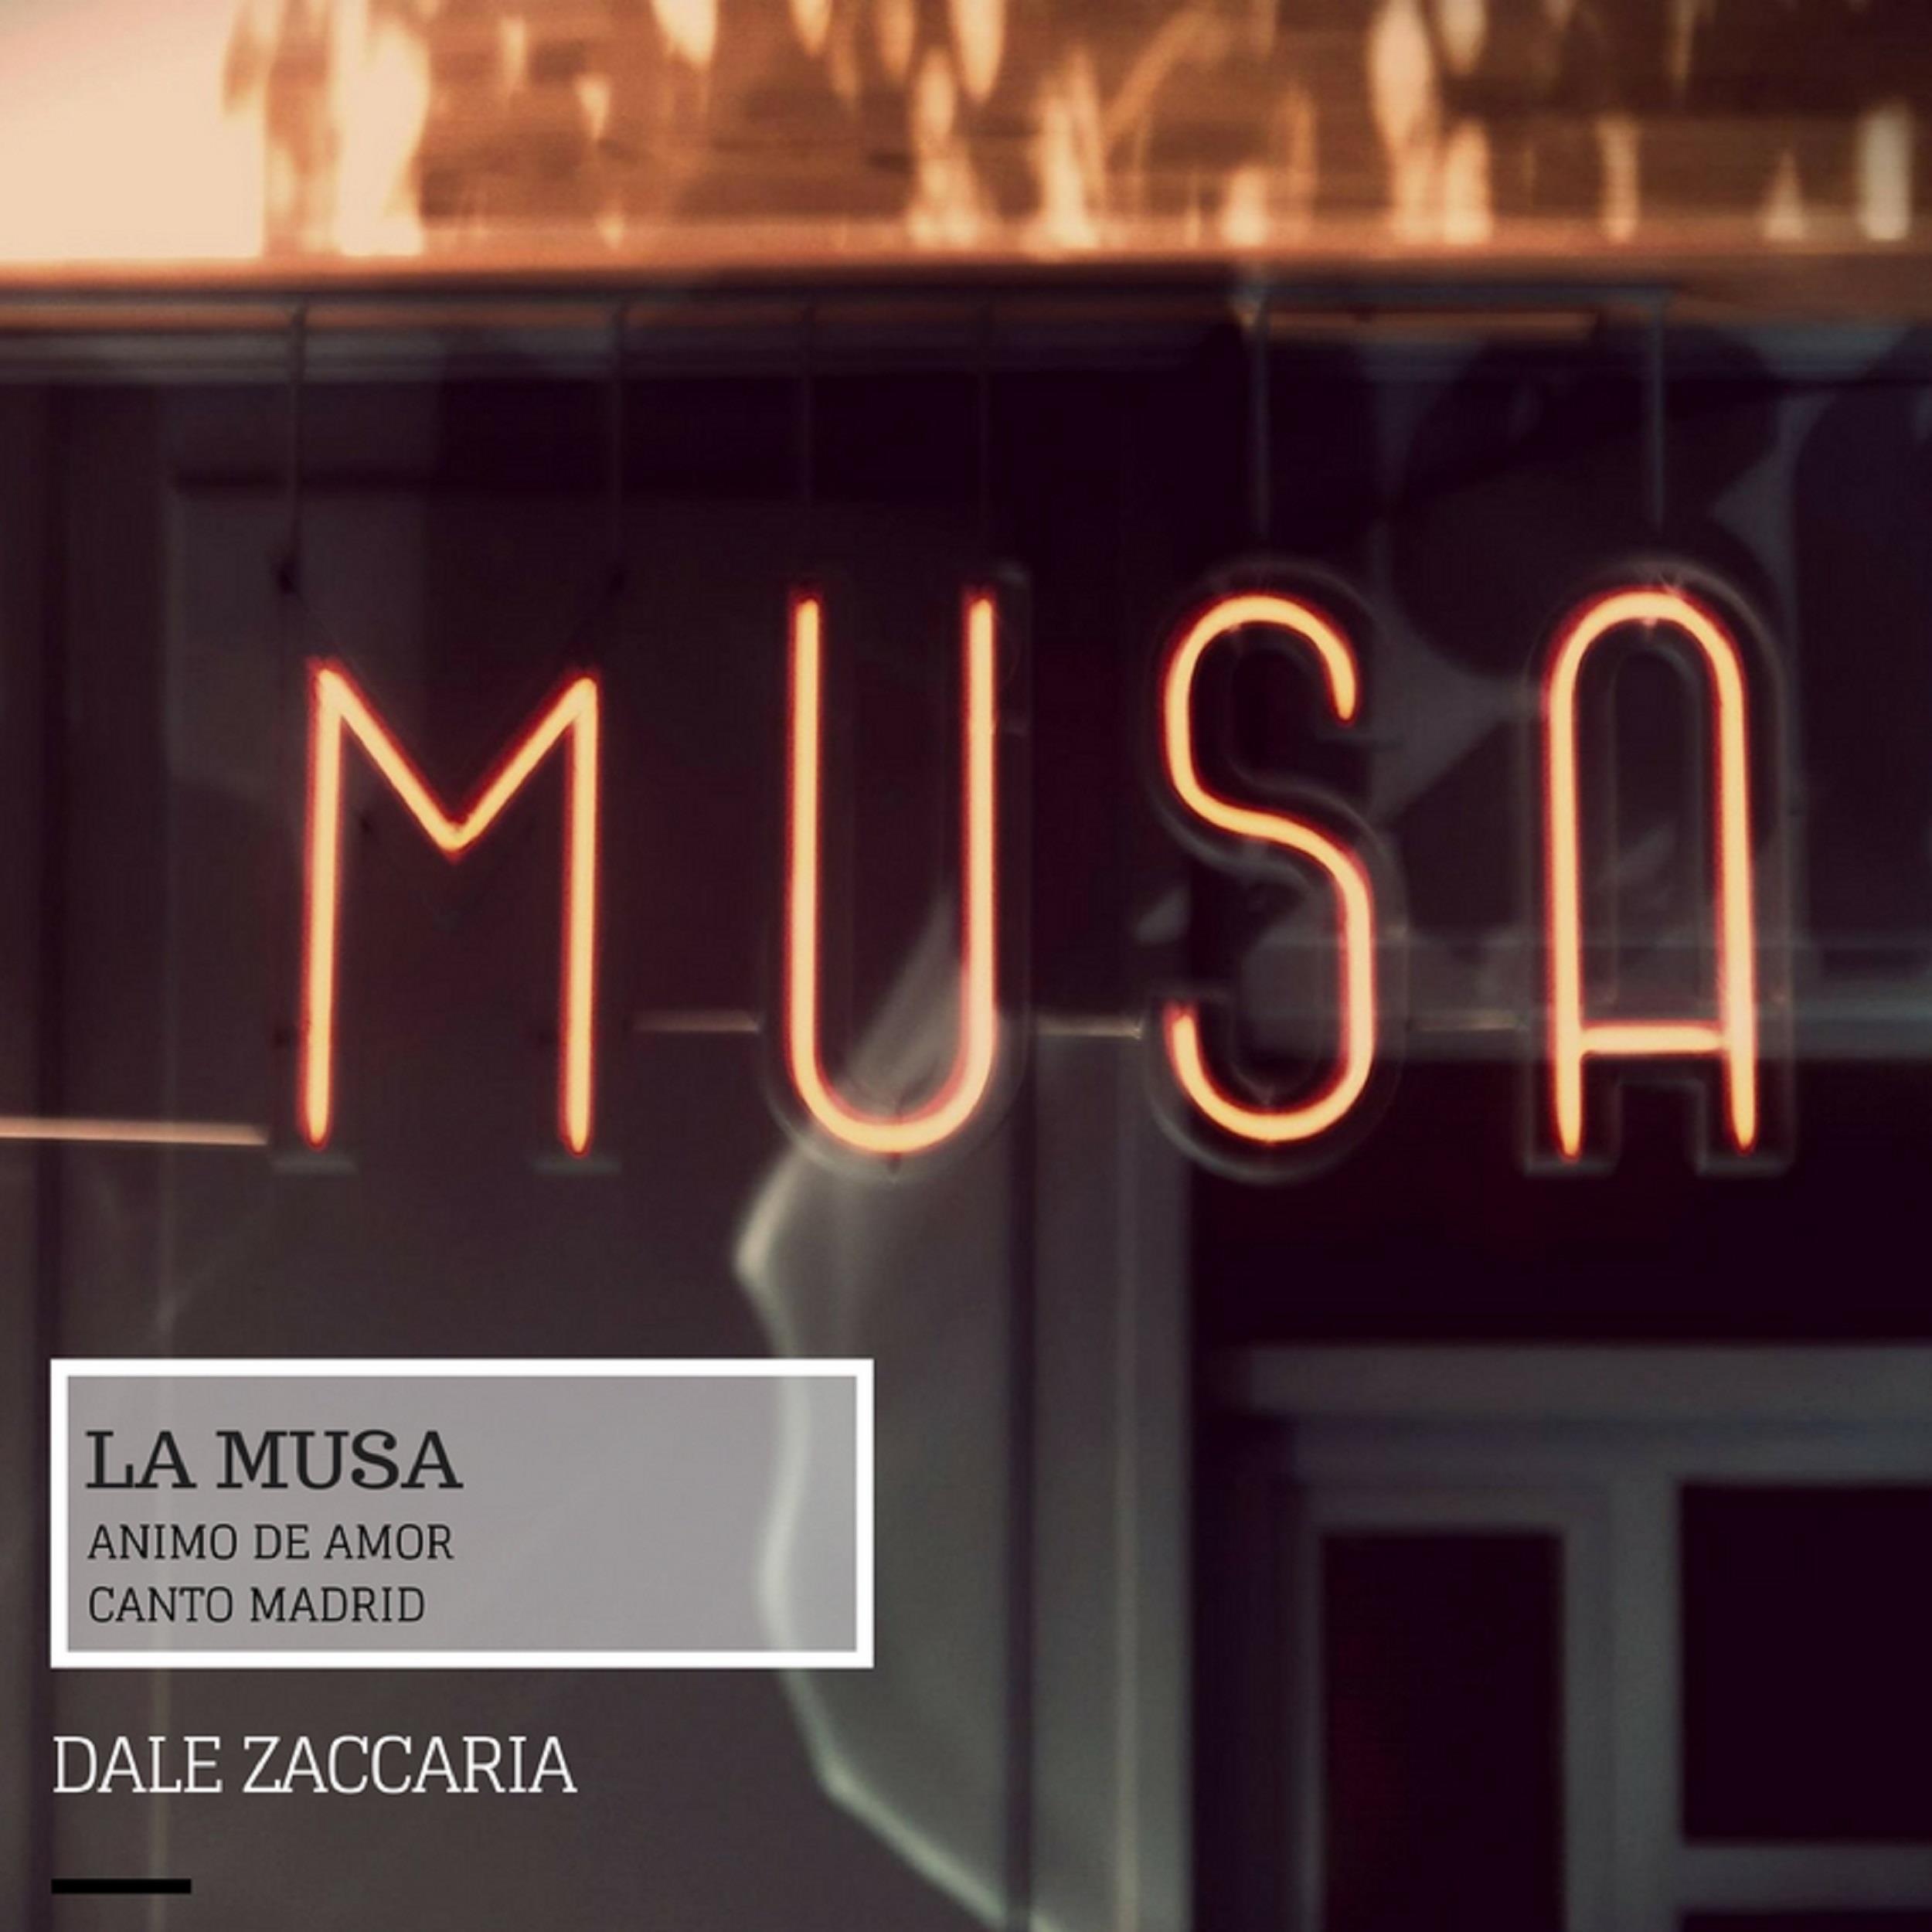 La Musa, animo de amor canto Madrid II